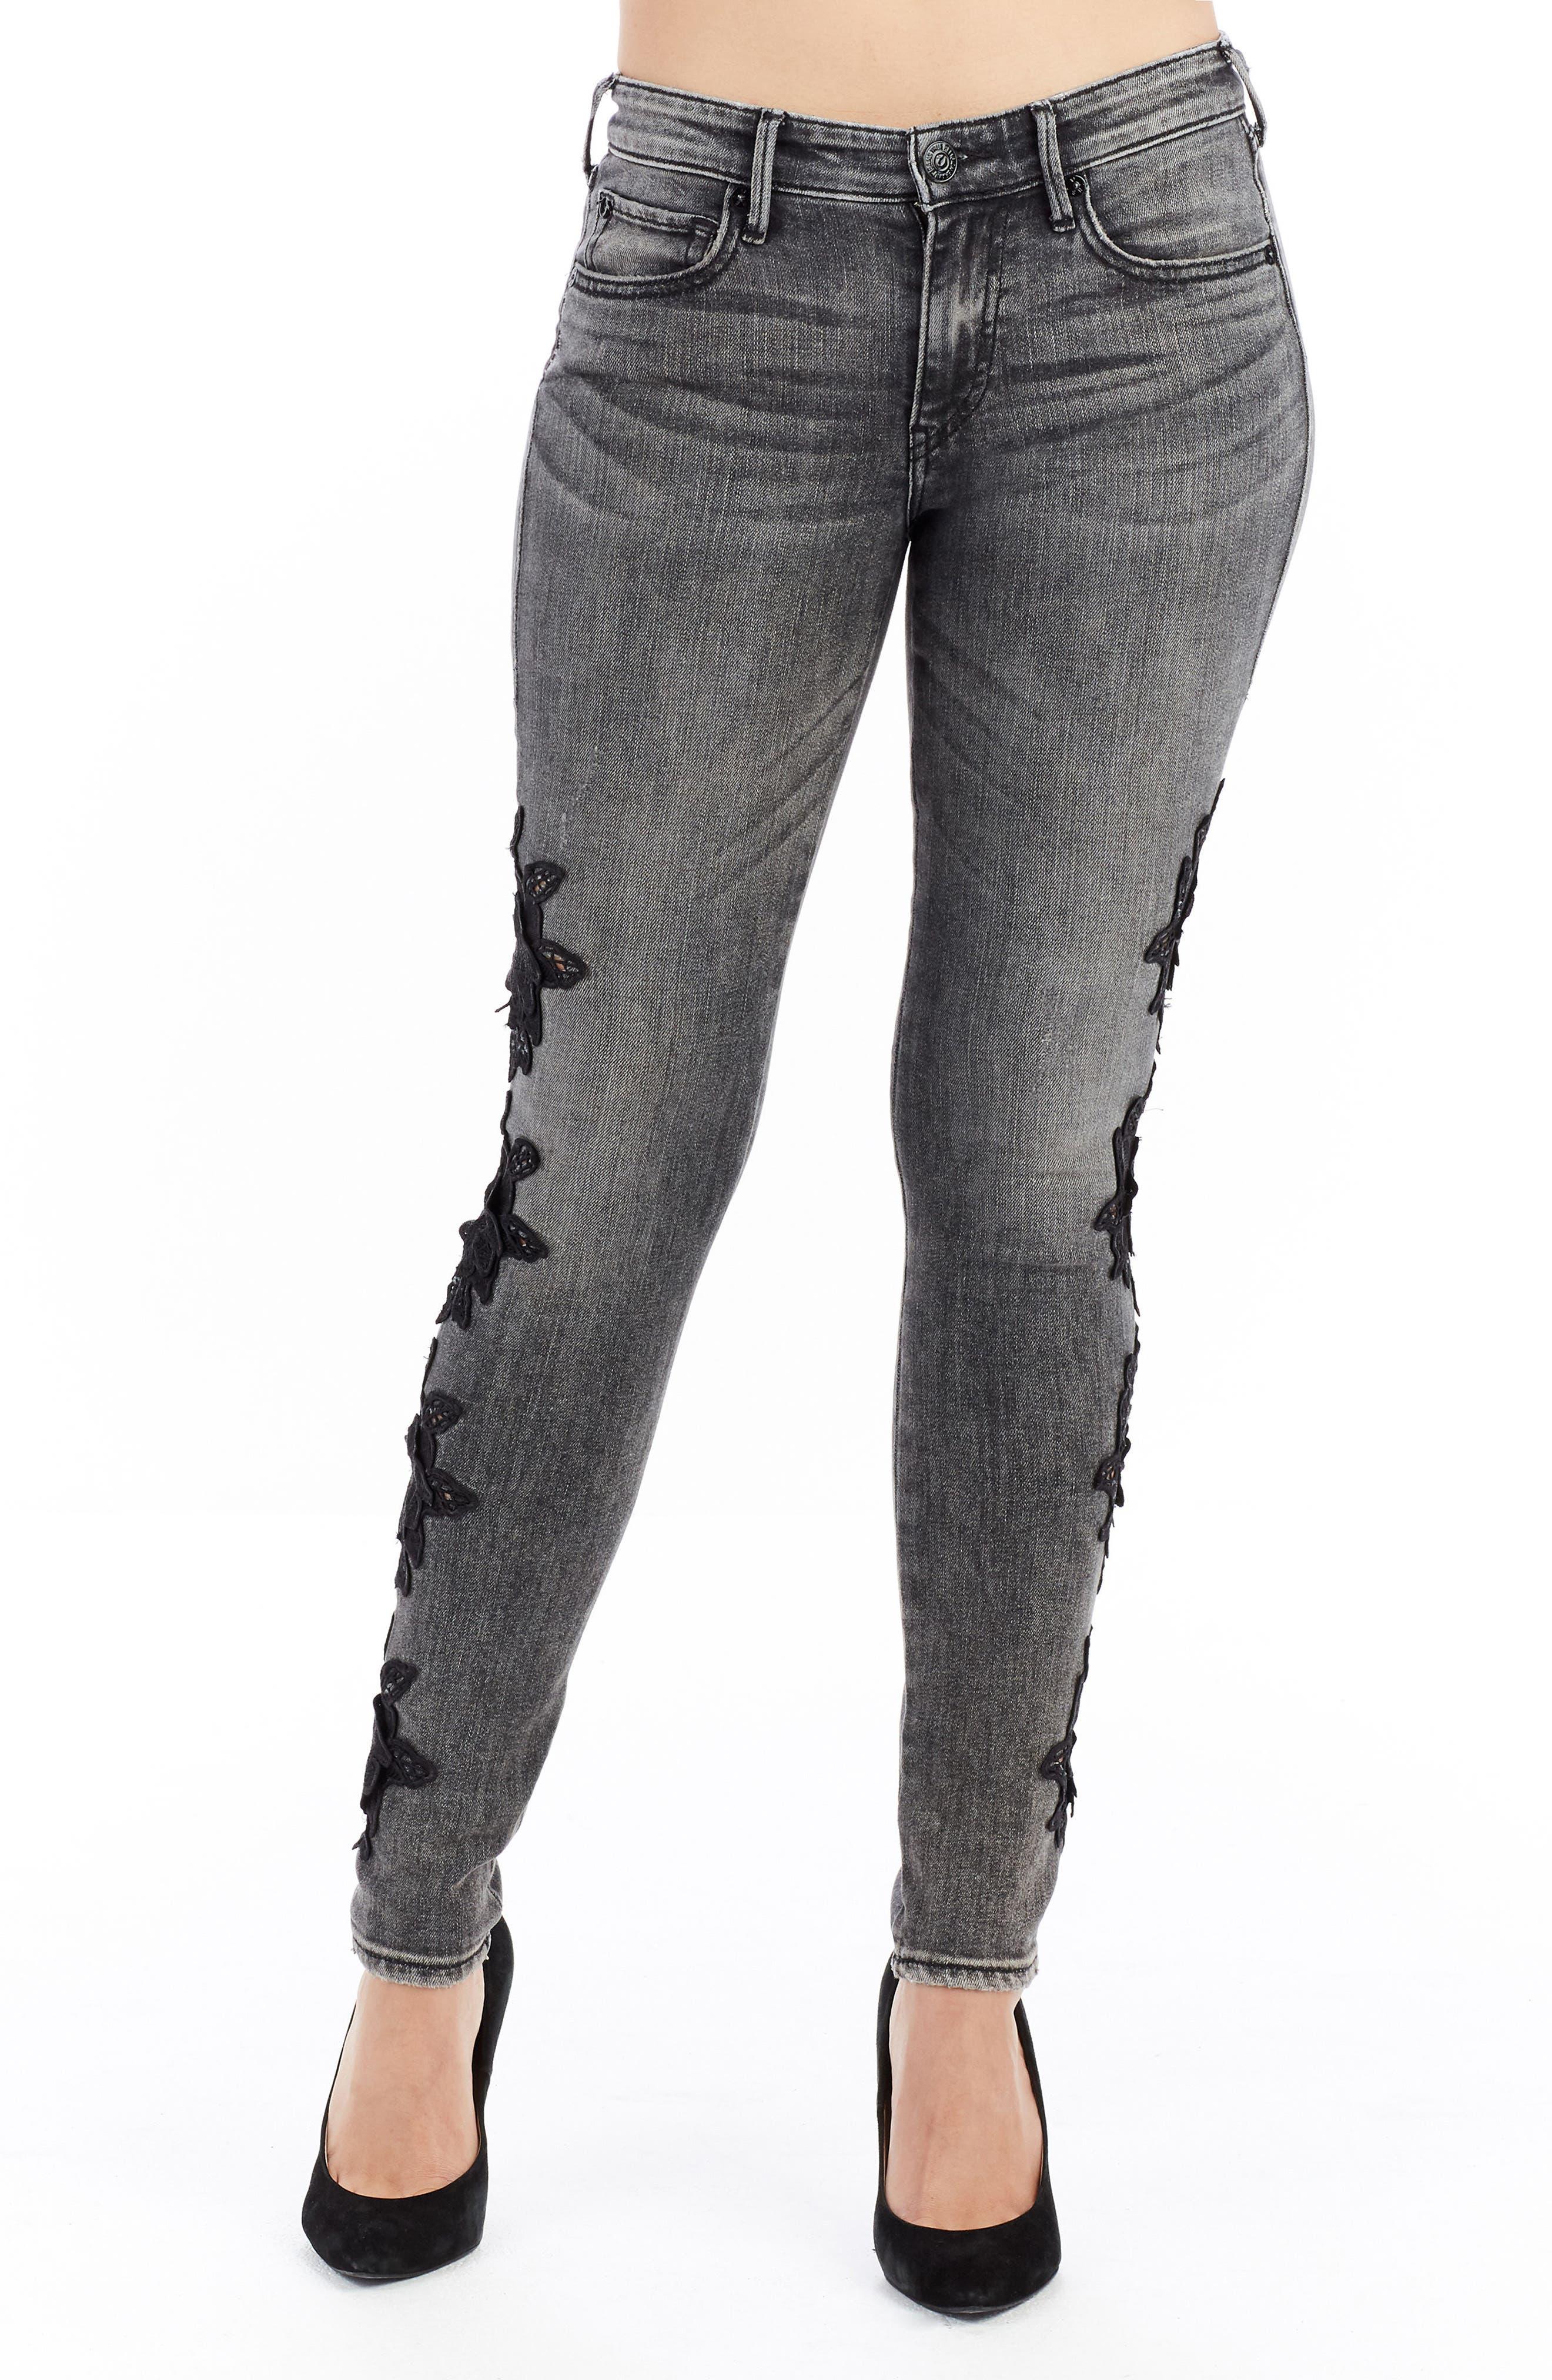 Jennie Curvy Skinny Jeans,                         Main,                         color, Rhodium